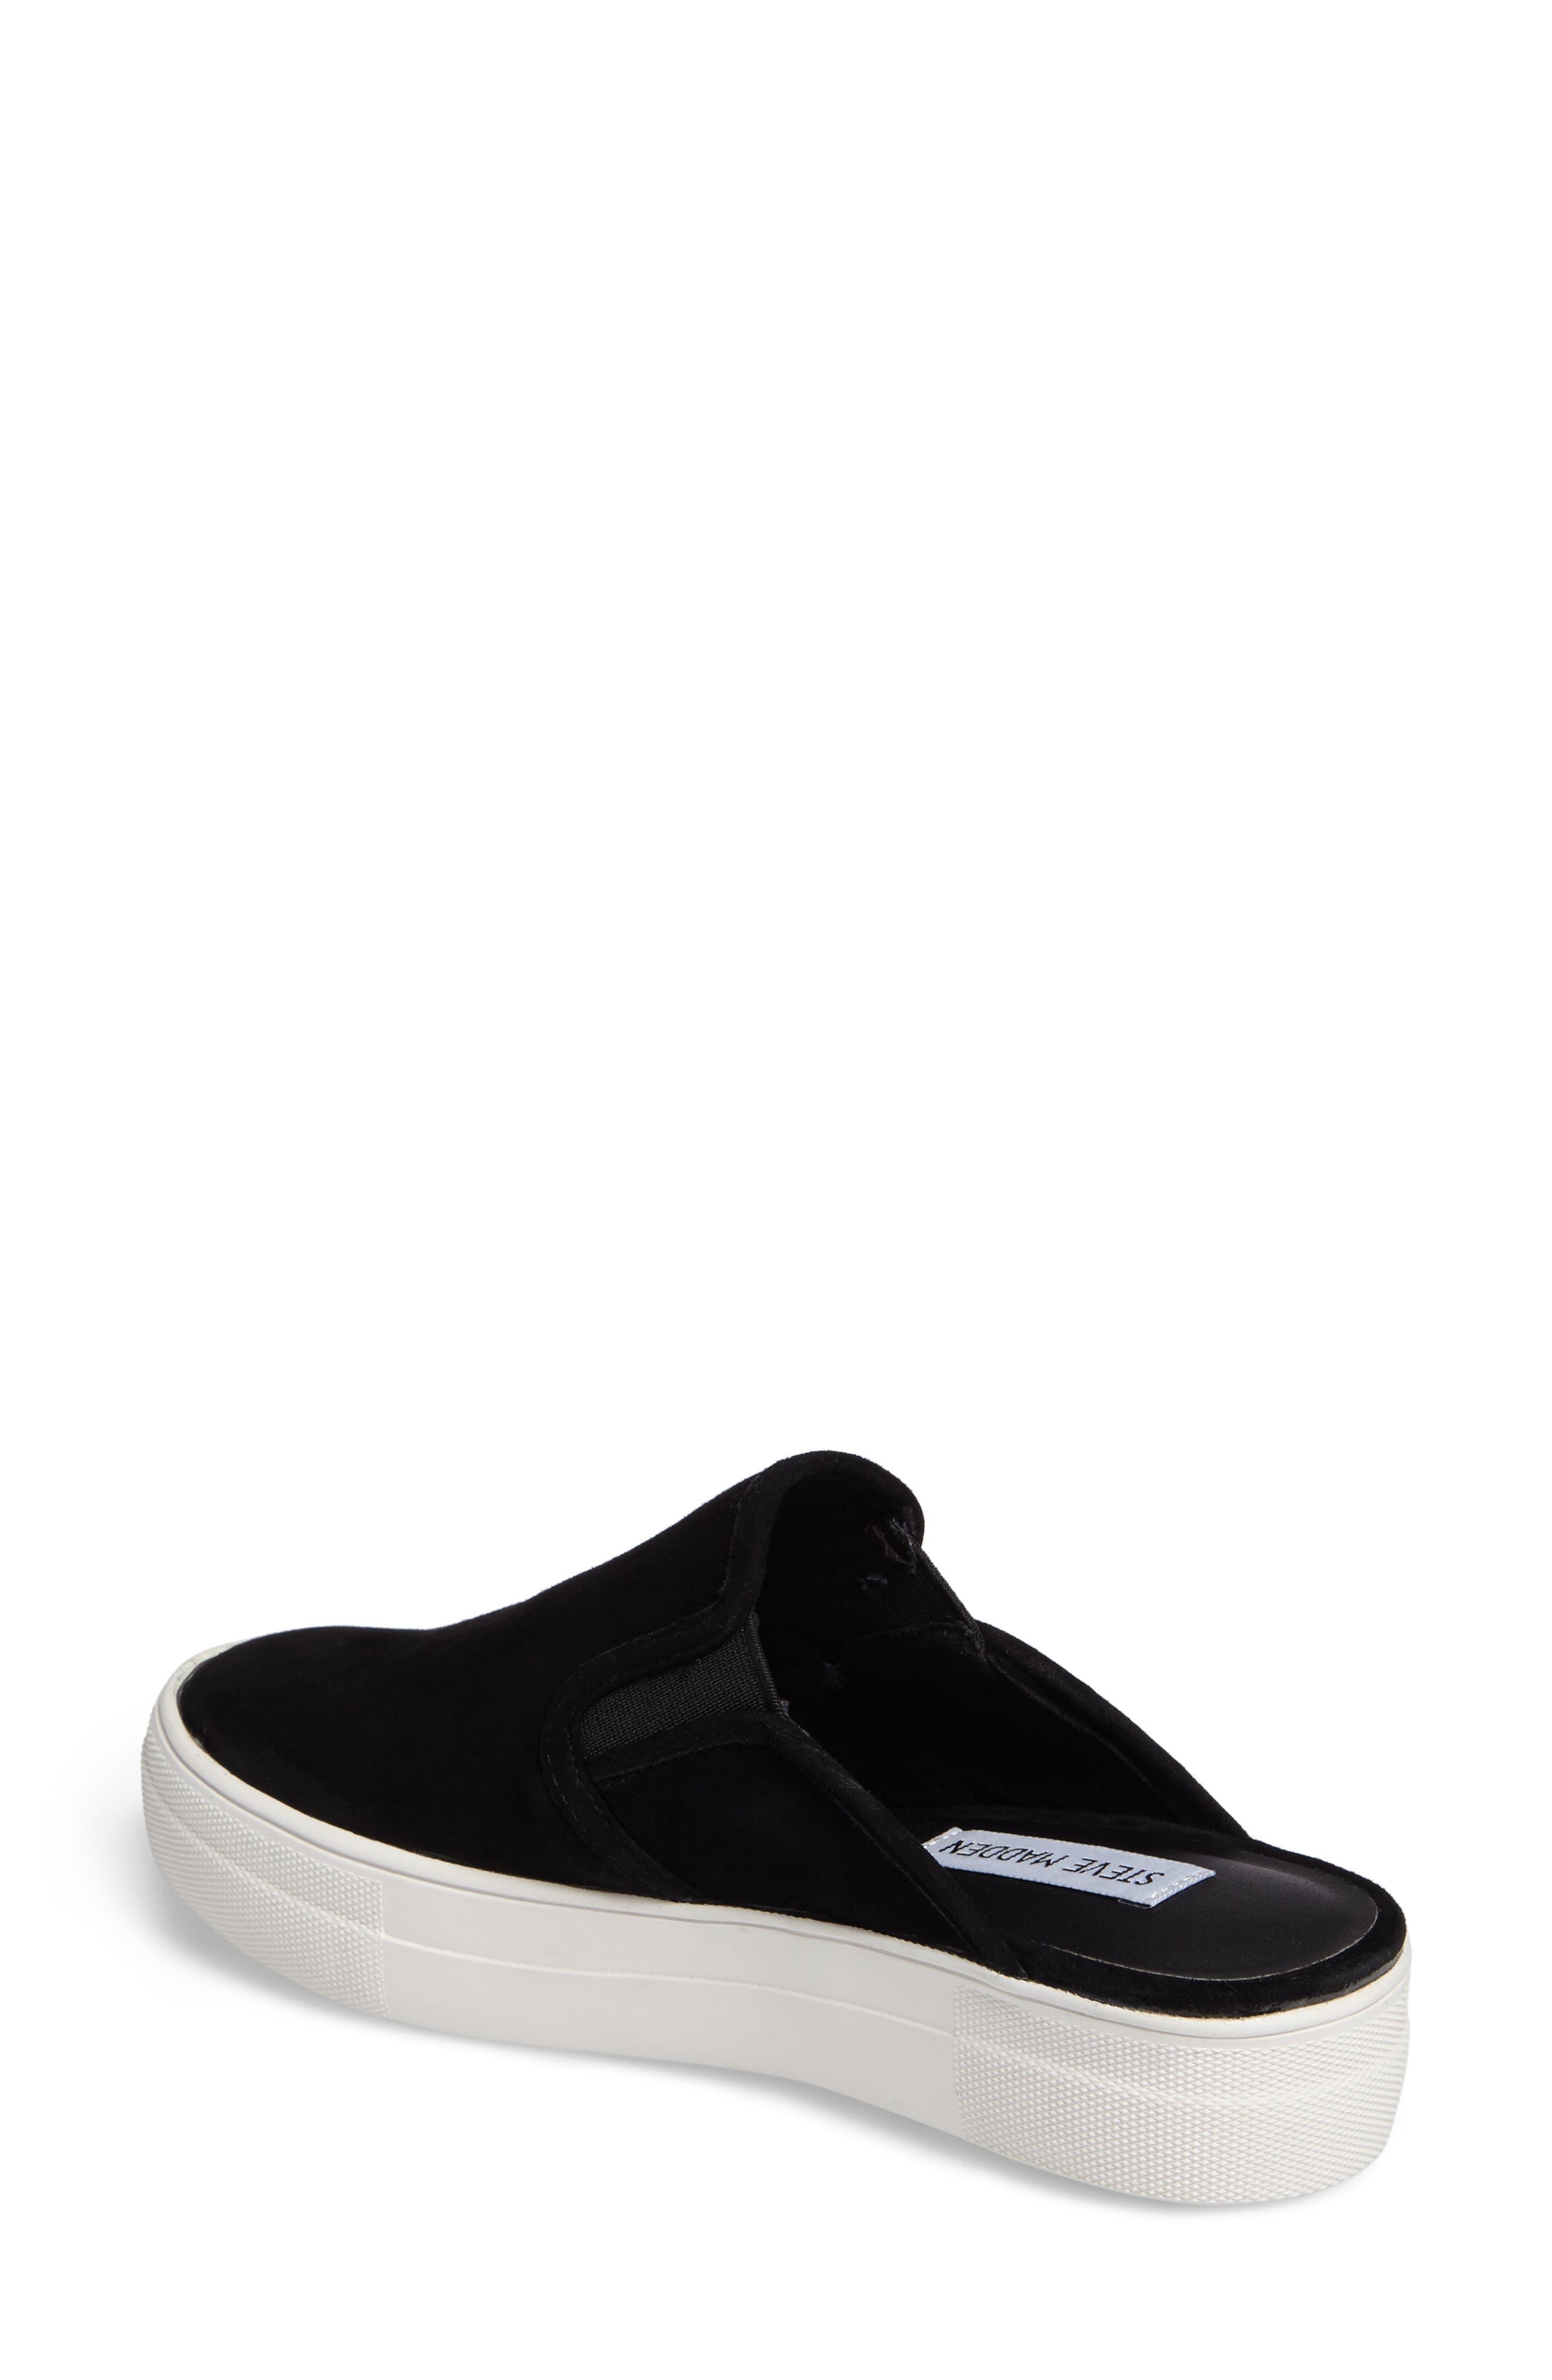 Glenda Sneaker Mule,                             Alternate thumbnail 2, color,                             006